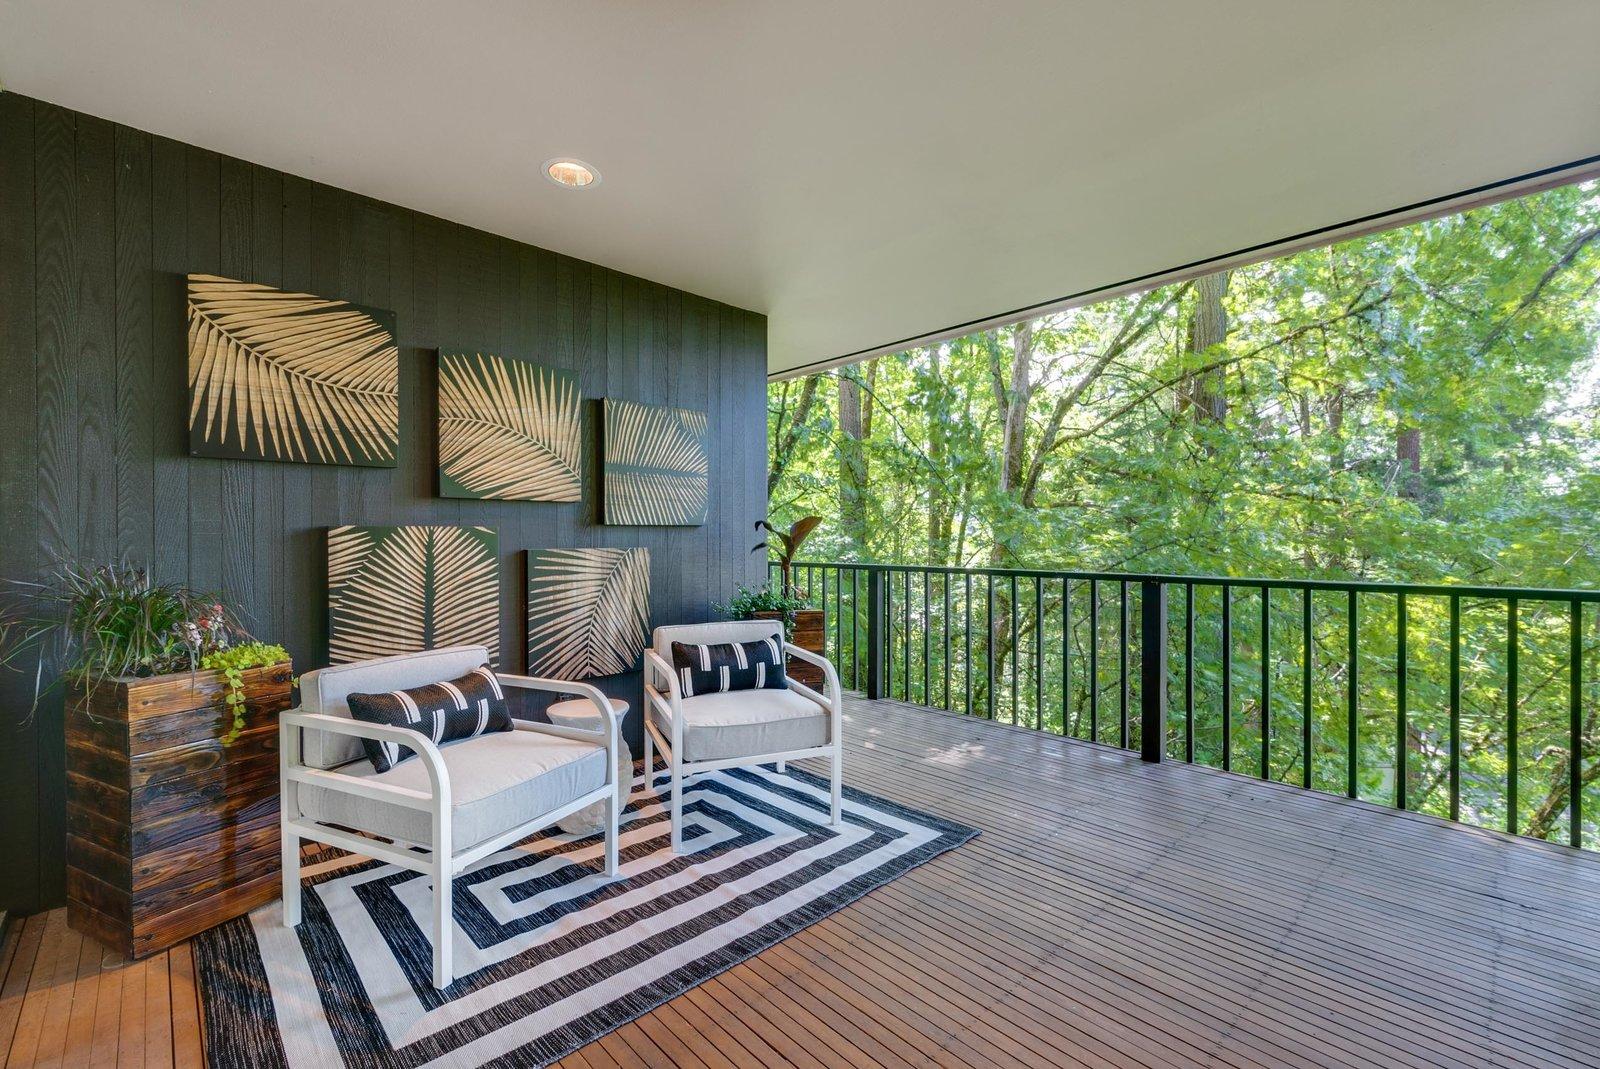 William Fletcher Portland Midcentury Home patio